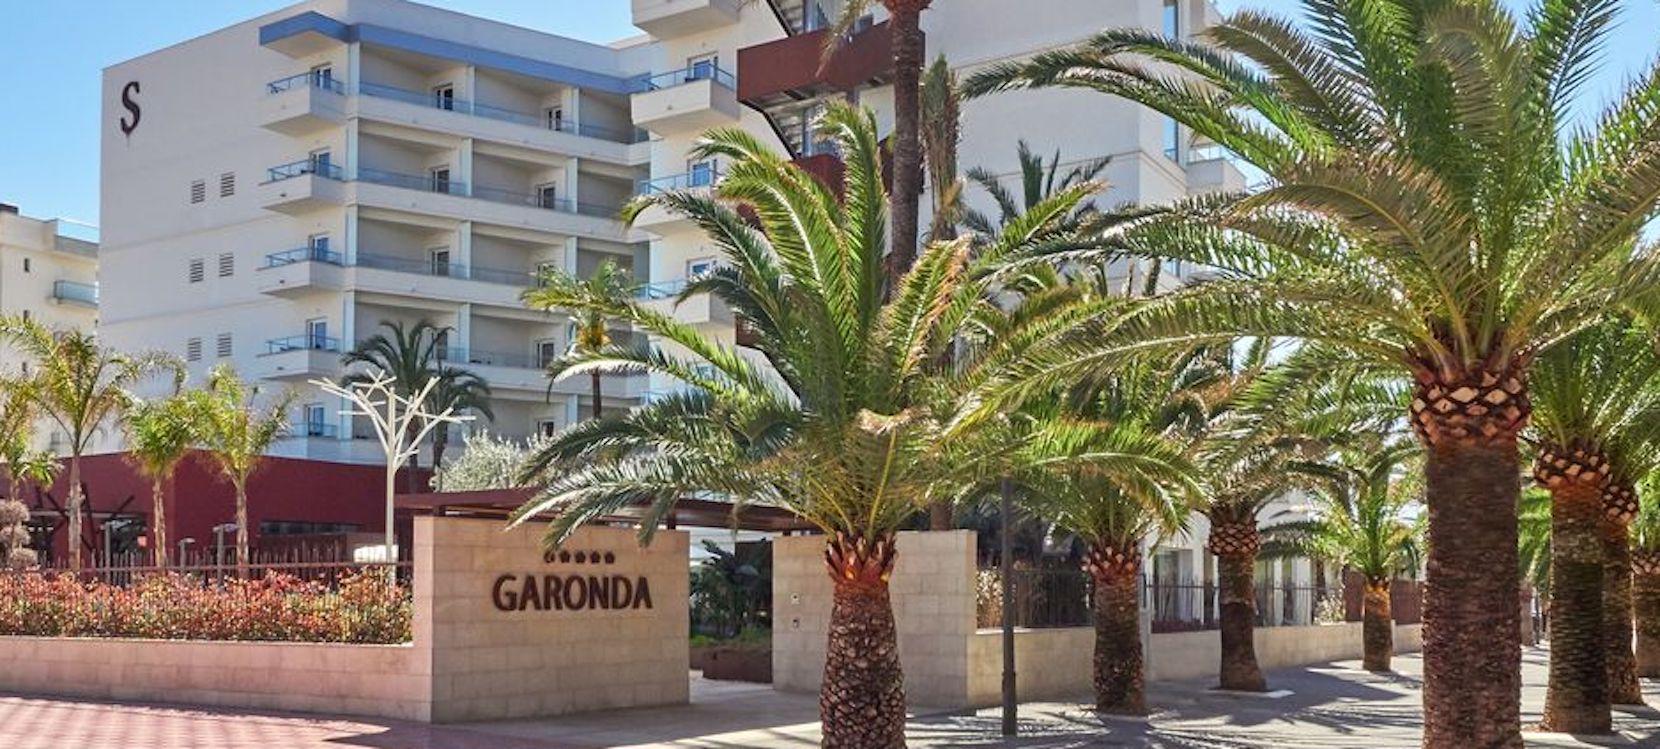 Pure Salt , Garonda Palme de Mallorca / Spain